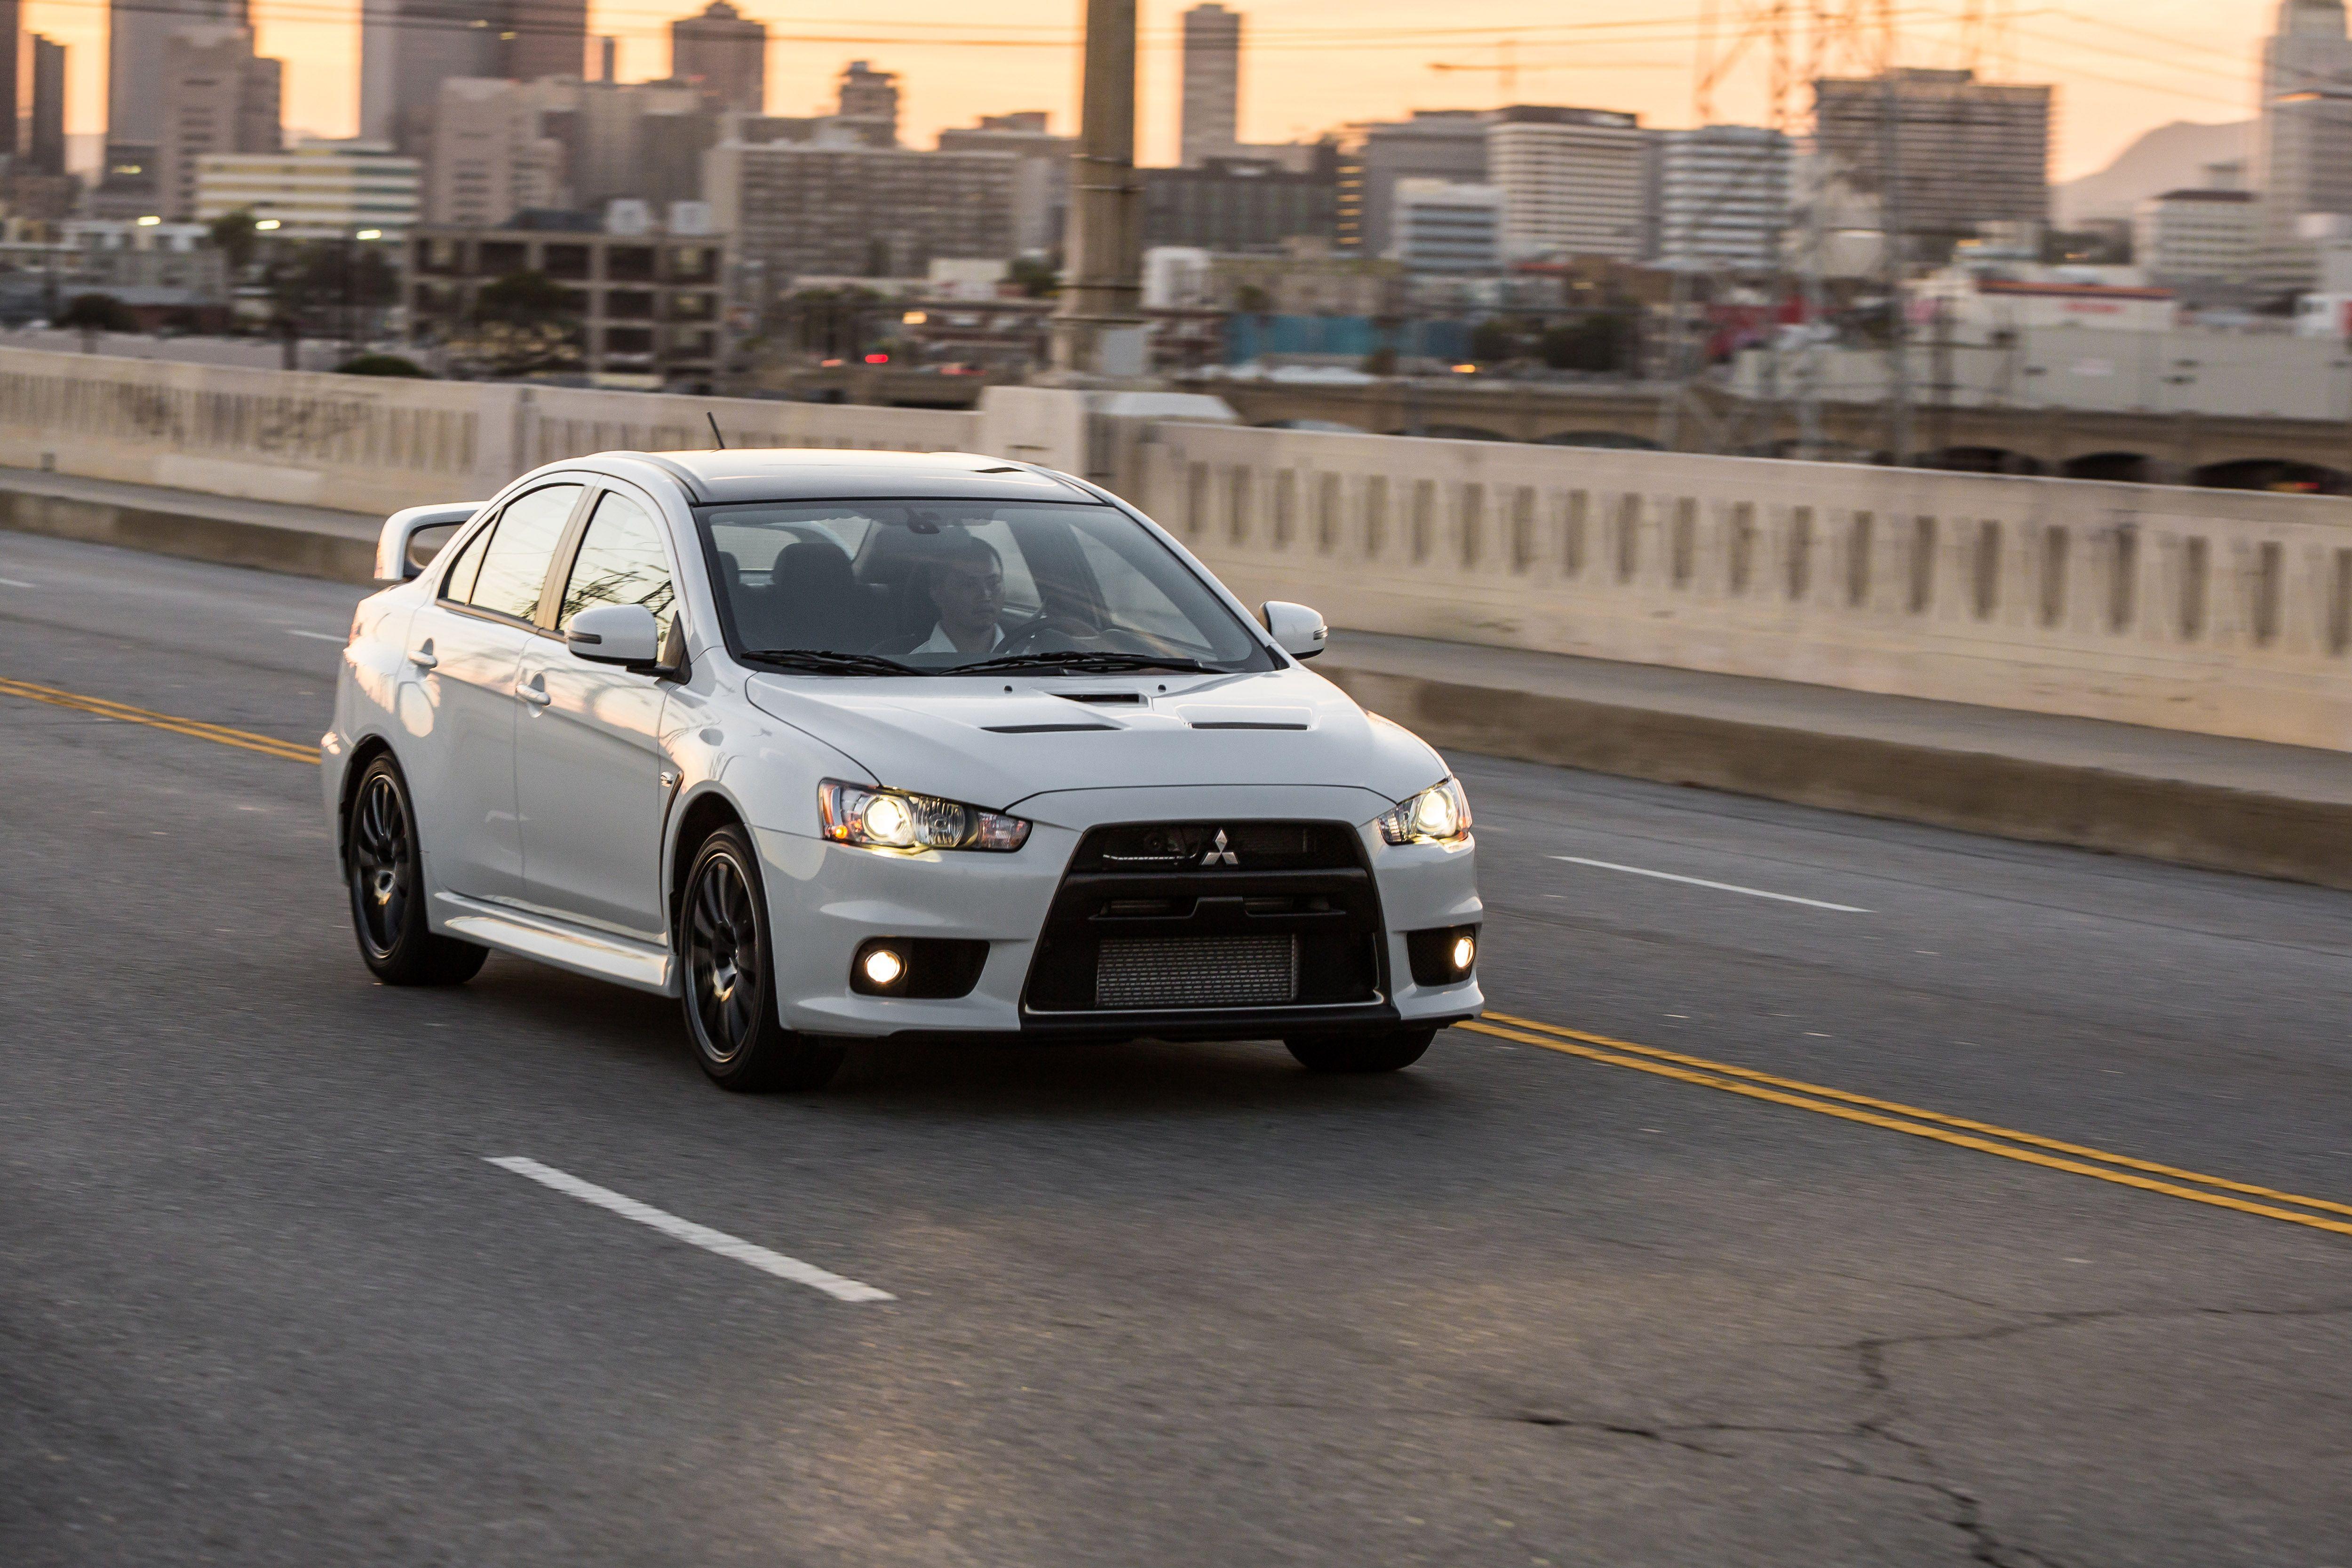 10 Reasons Why The Mitsubishi Lancer Evo X Can Still Compete With The Subaru STI